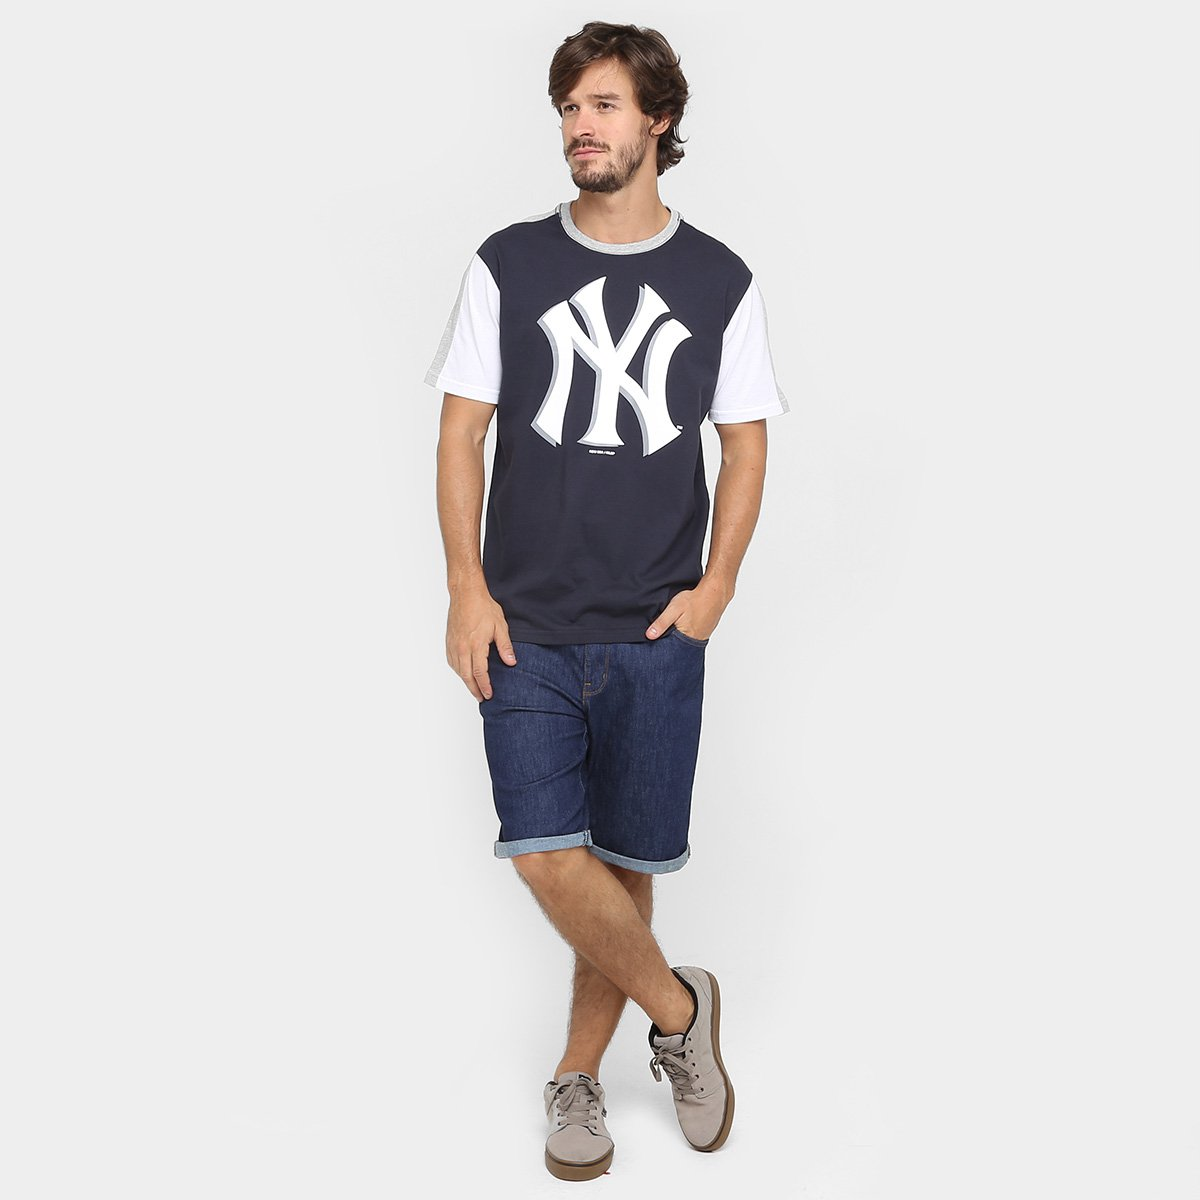 Camiseta New Era MLB Tape 27 New York Yankees - Compre Agora  73d06f44cce